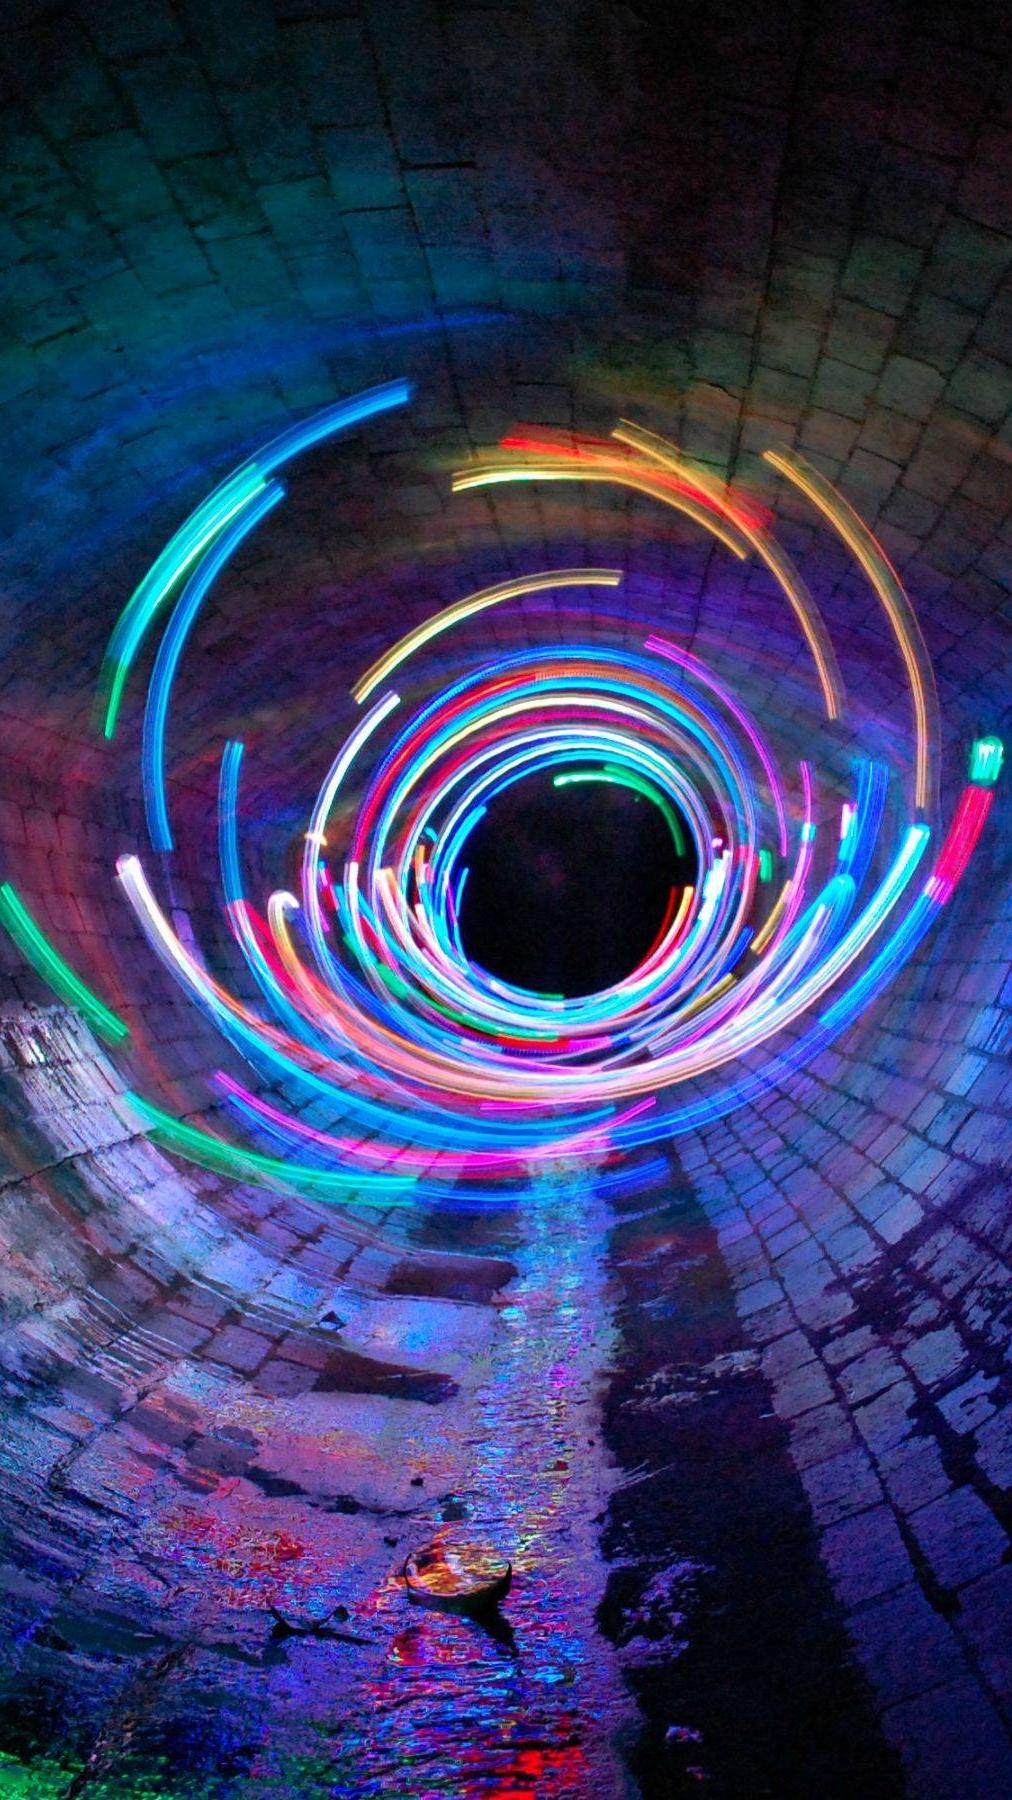 Long Exposure Lights Tunnel iPhone Wallpaper iphoneswallpapers com